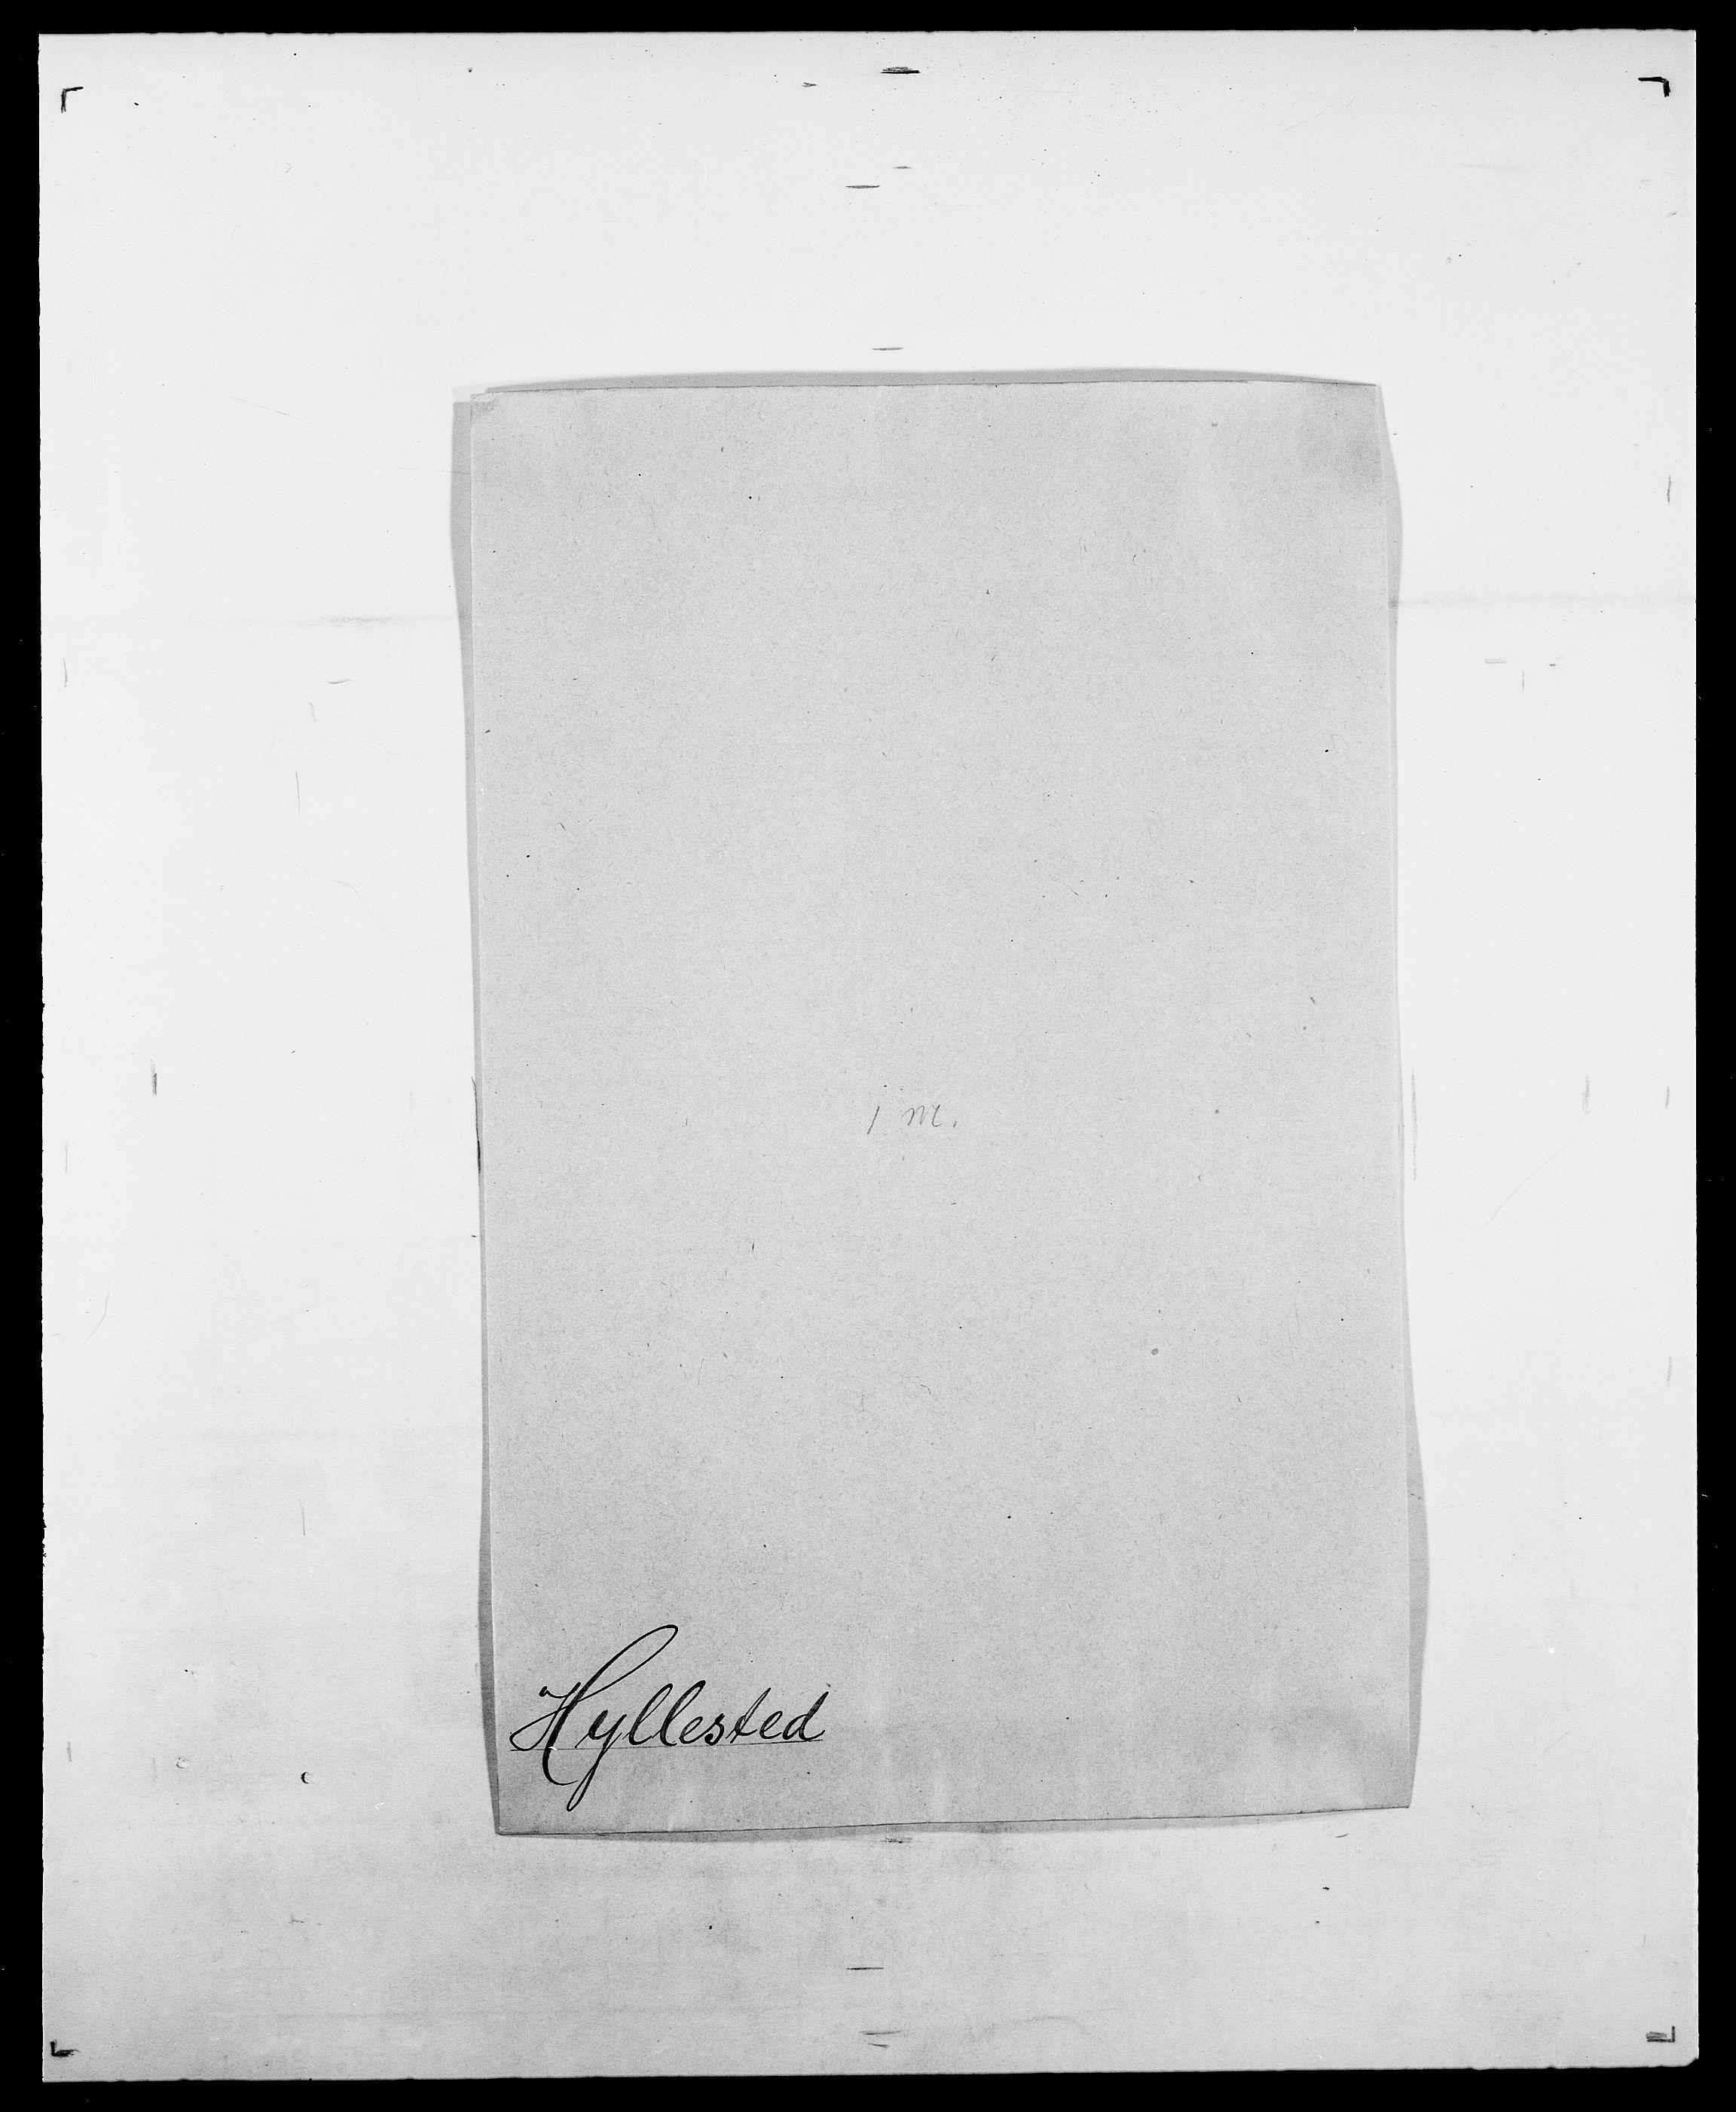 SAO, Delgobe, Charles Antoine - samling, D/Da/L0019: van der Hude - Joys, s. 271